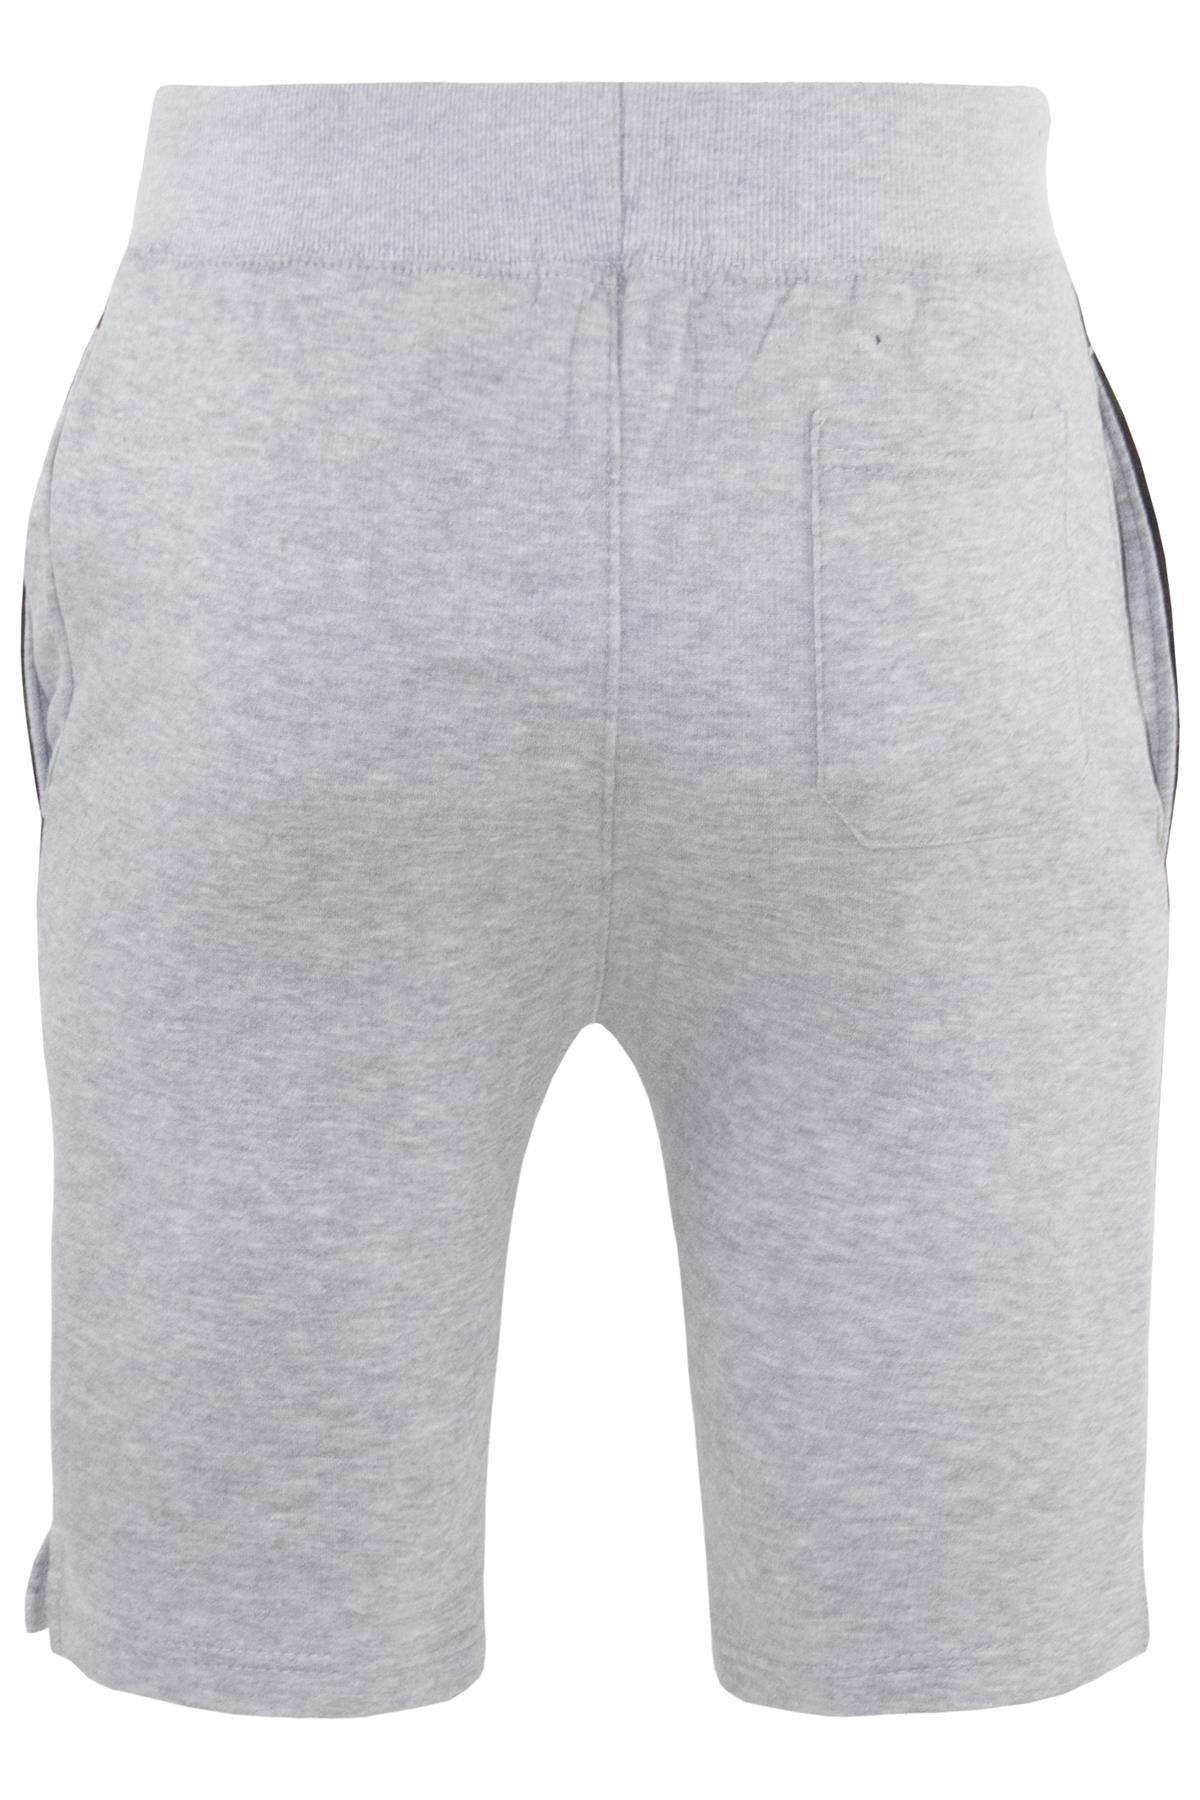 Mens-Contrast-Panel-Running-Summer-Side-Slit-Knee-Length-Fleece-Bottoms-Shorts thumbnail 7